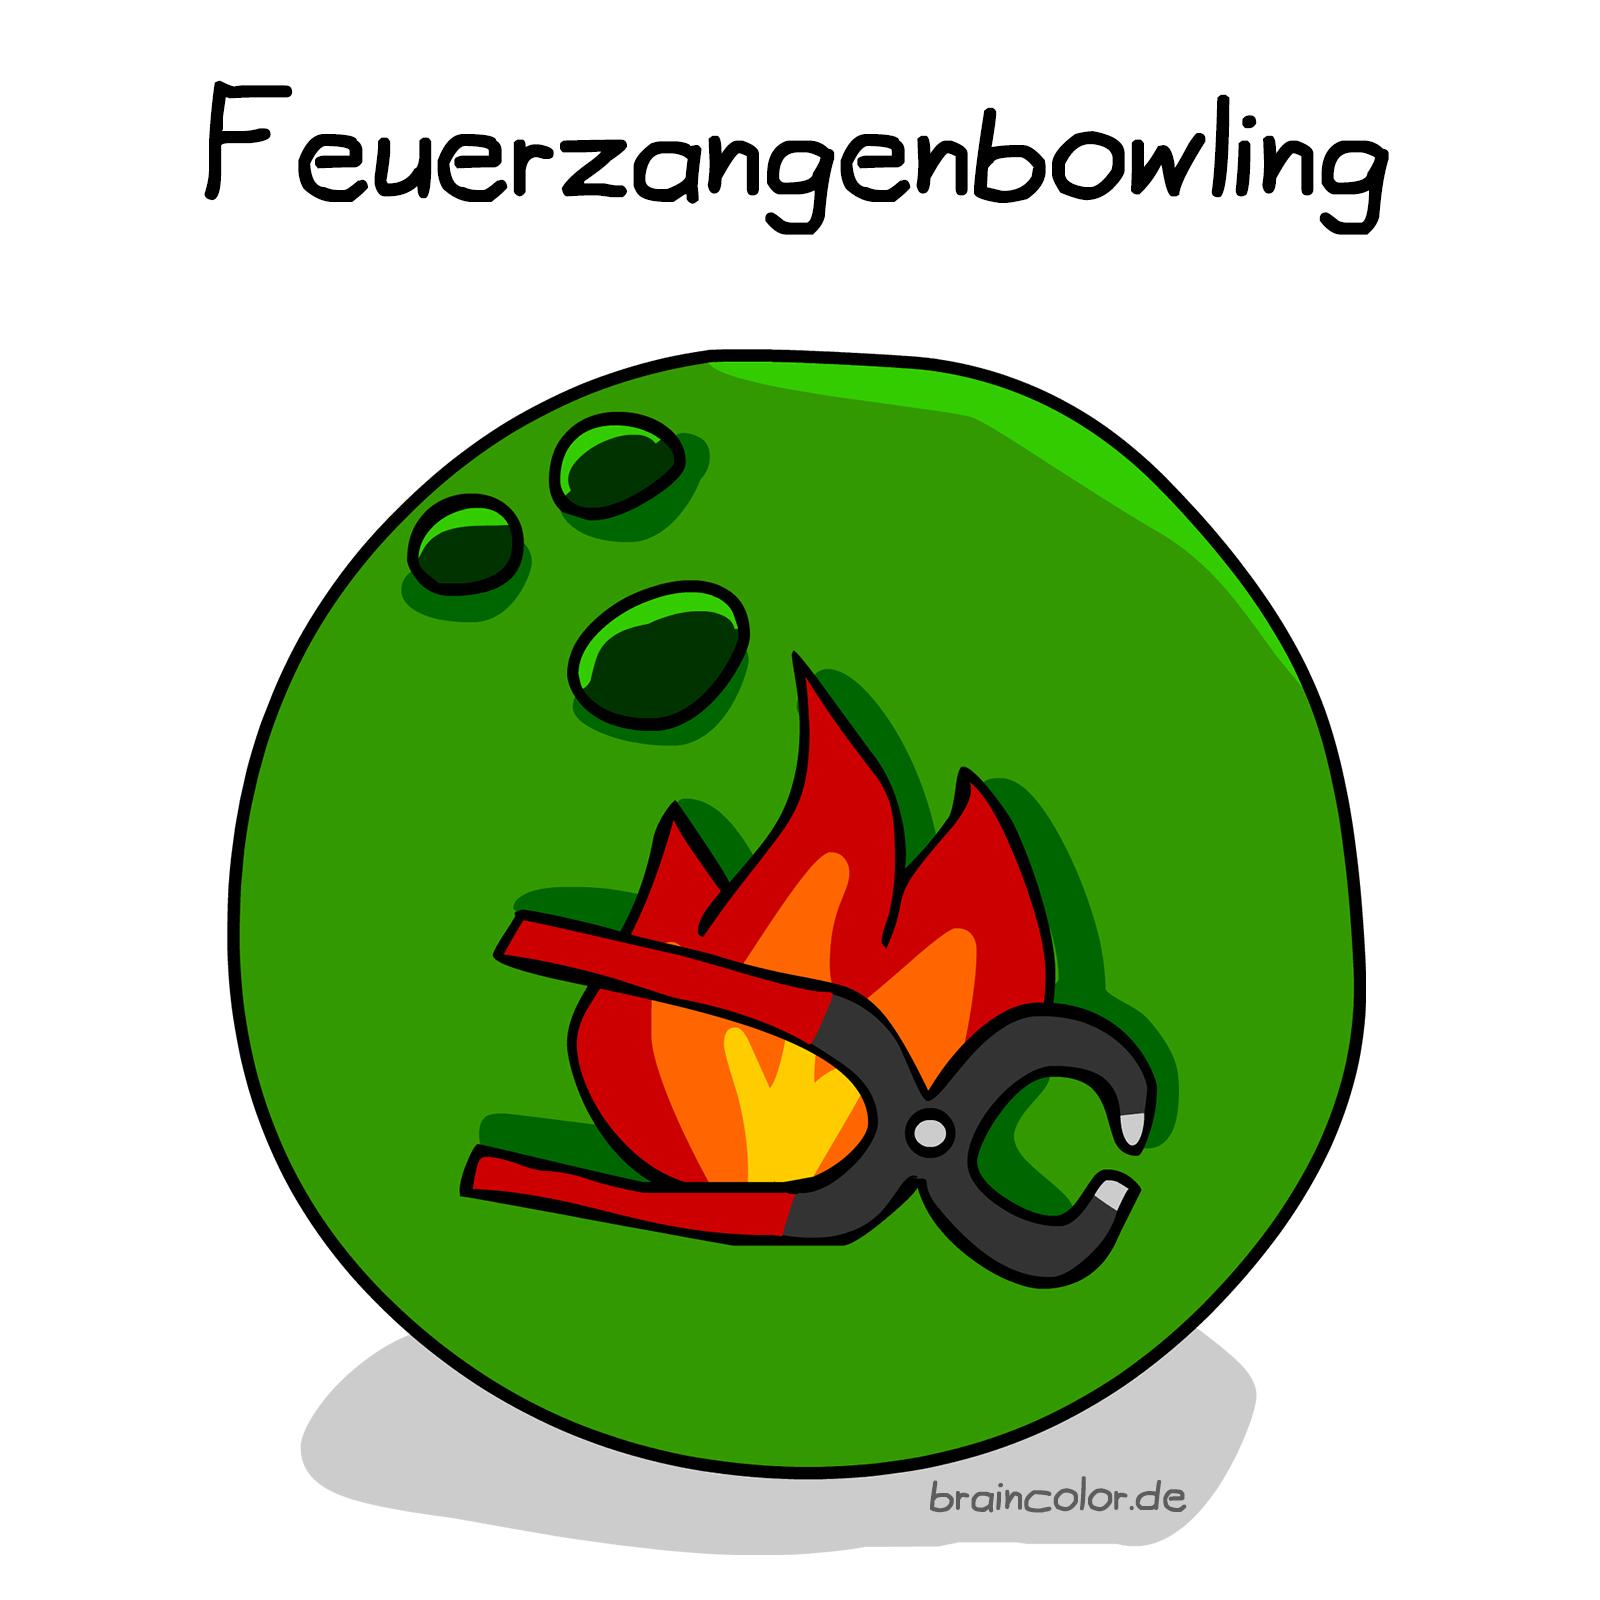 Feuerzangenbowling